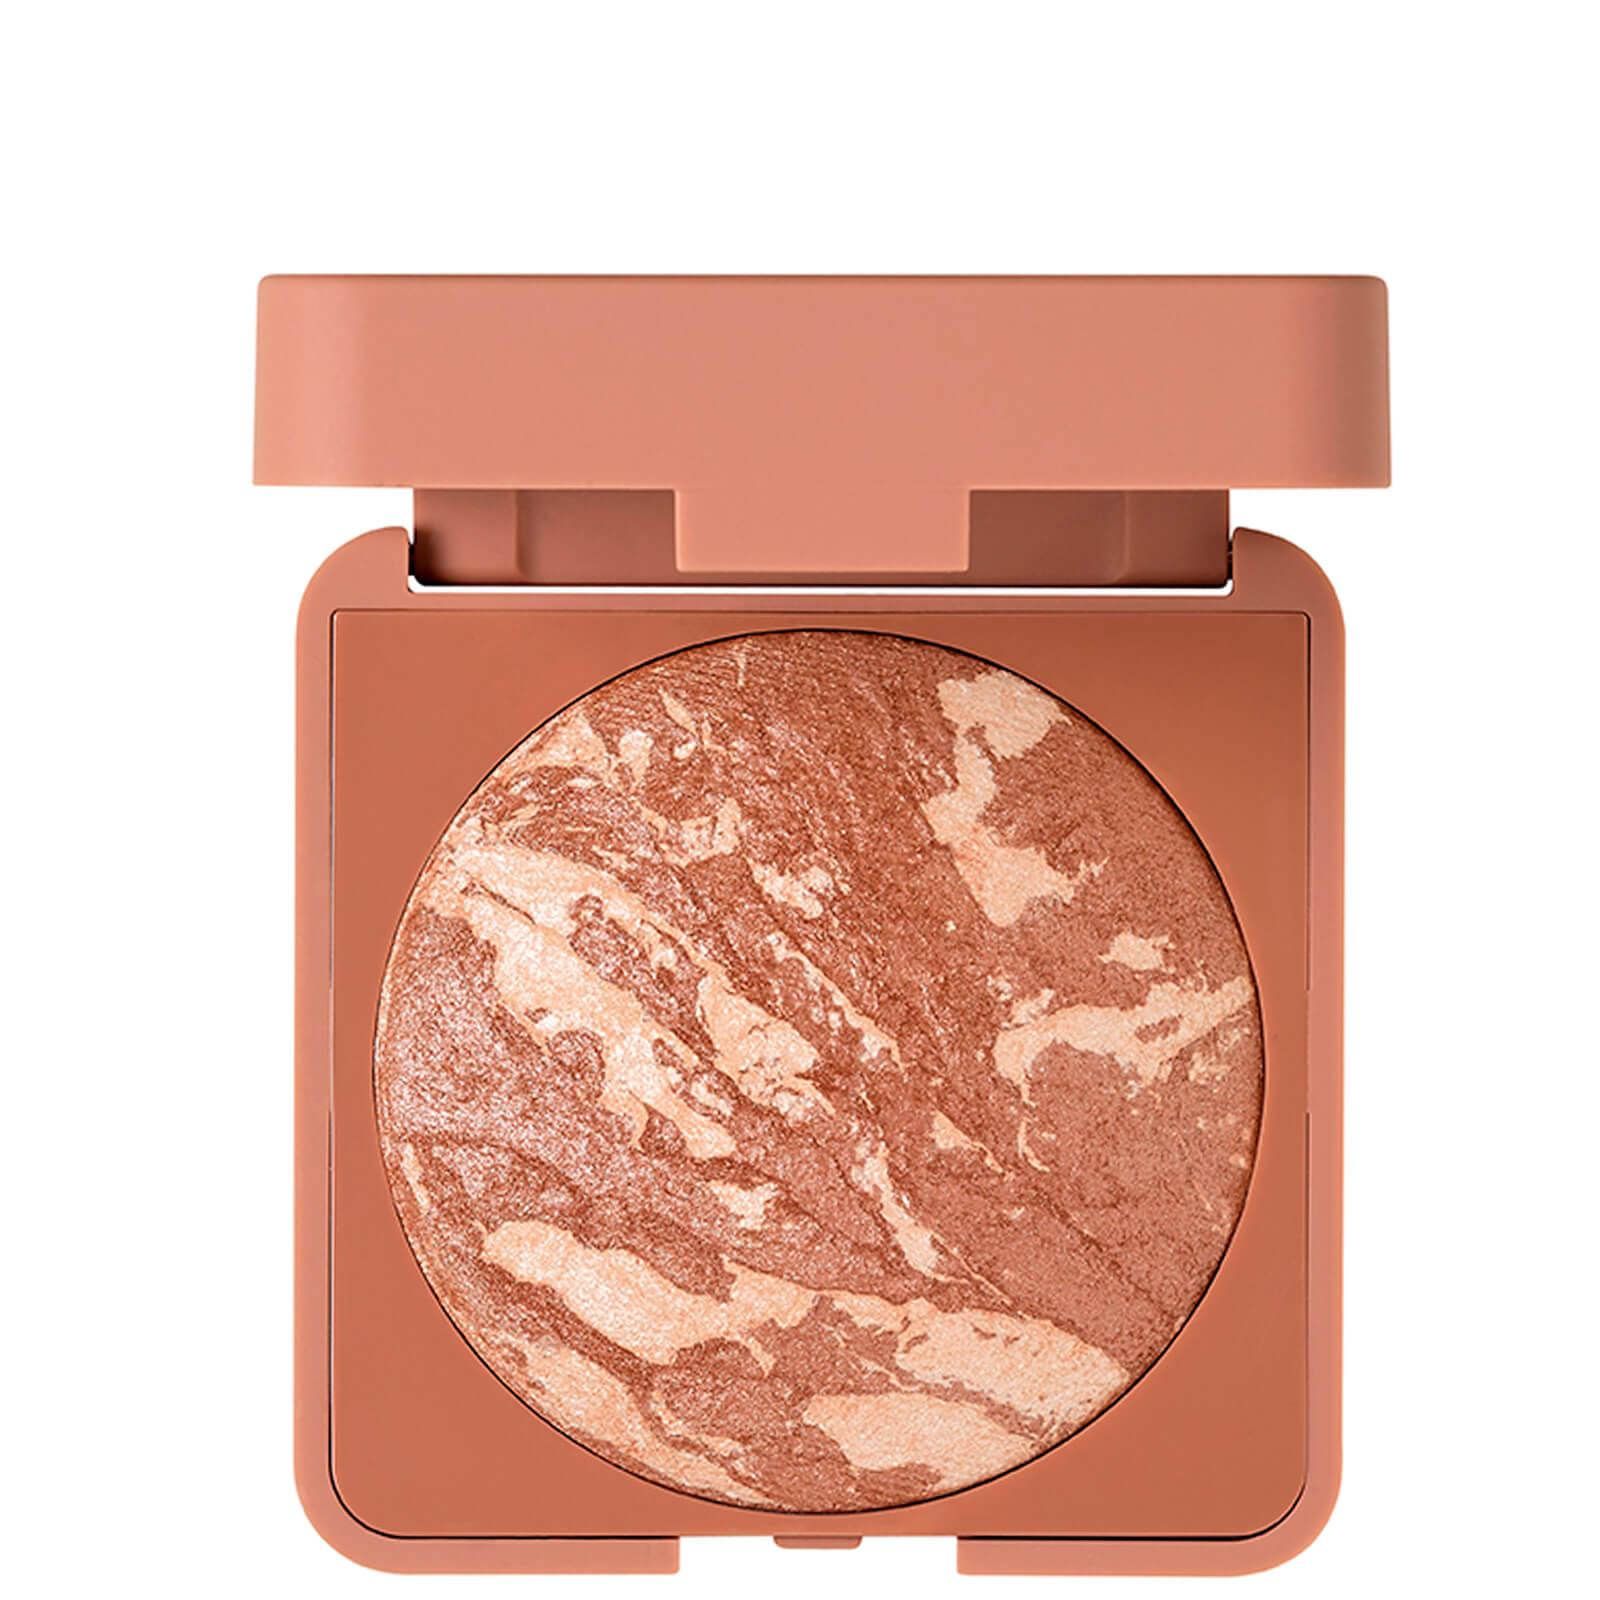 Купить 3INA Makeup The Glow Bronzer Powder 621